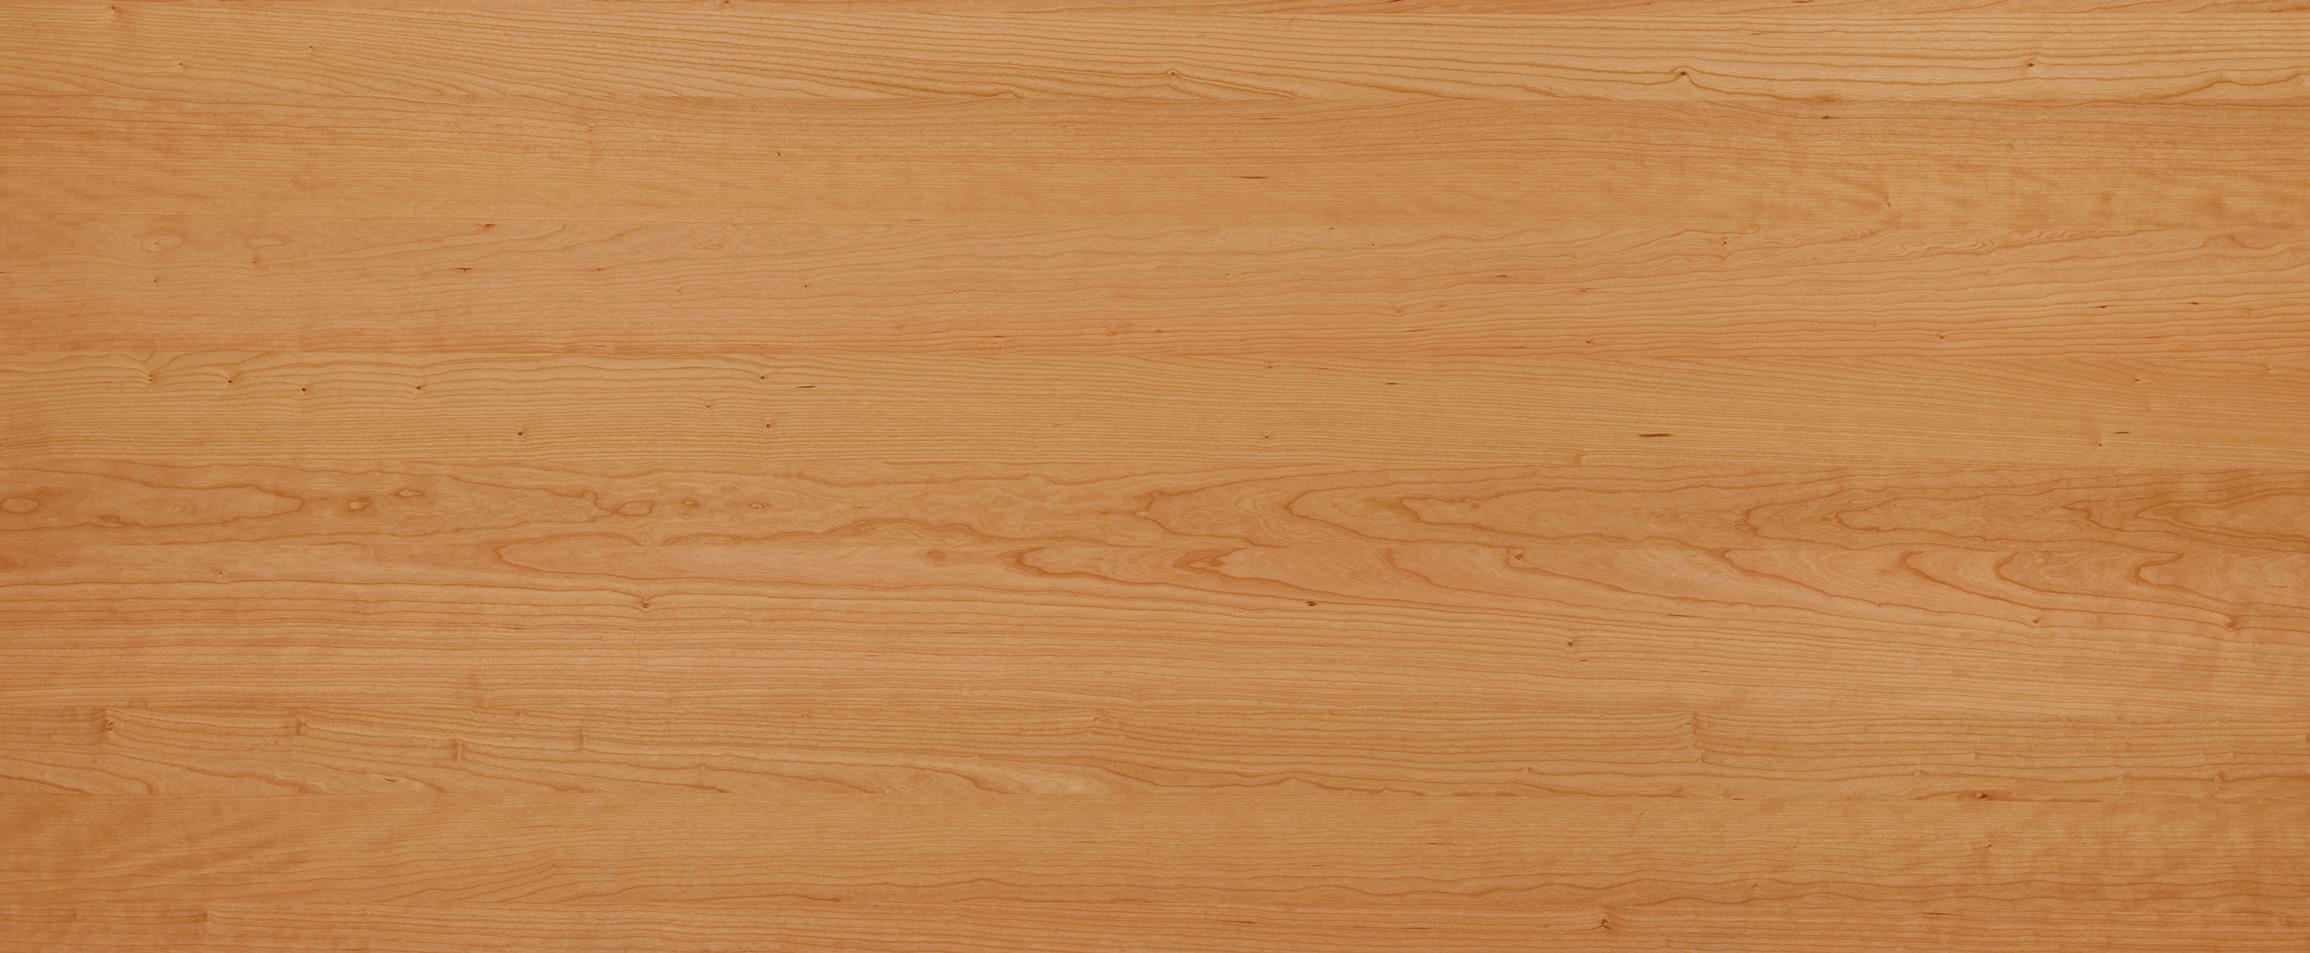 cherry-random-plank_8009934672_o